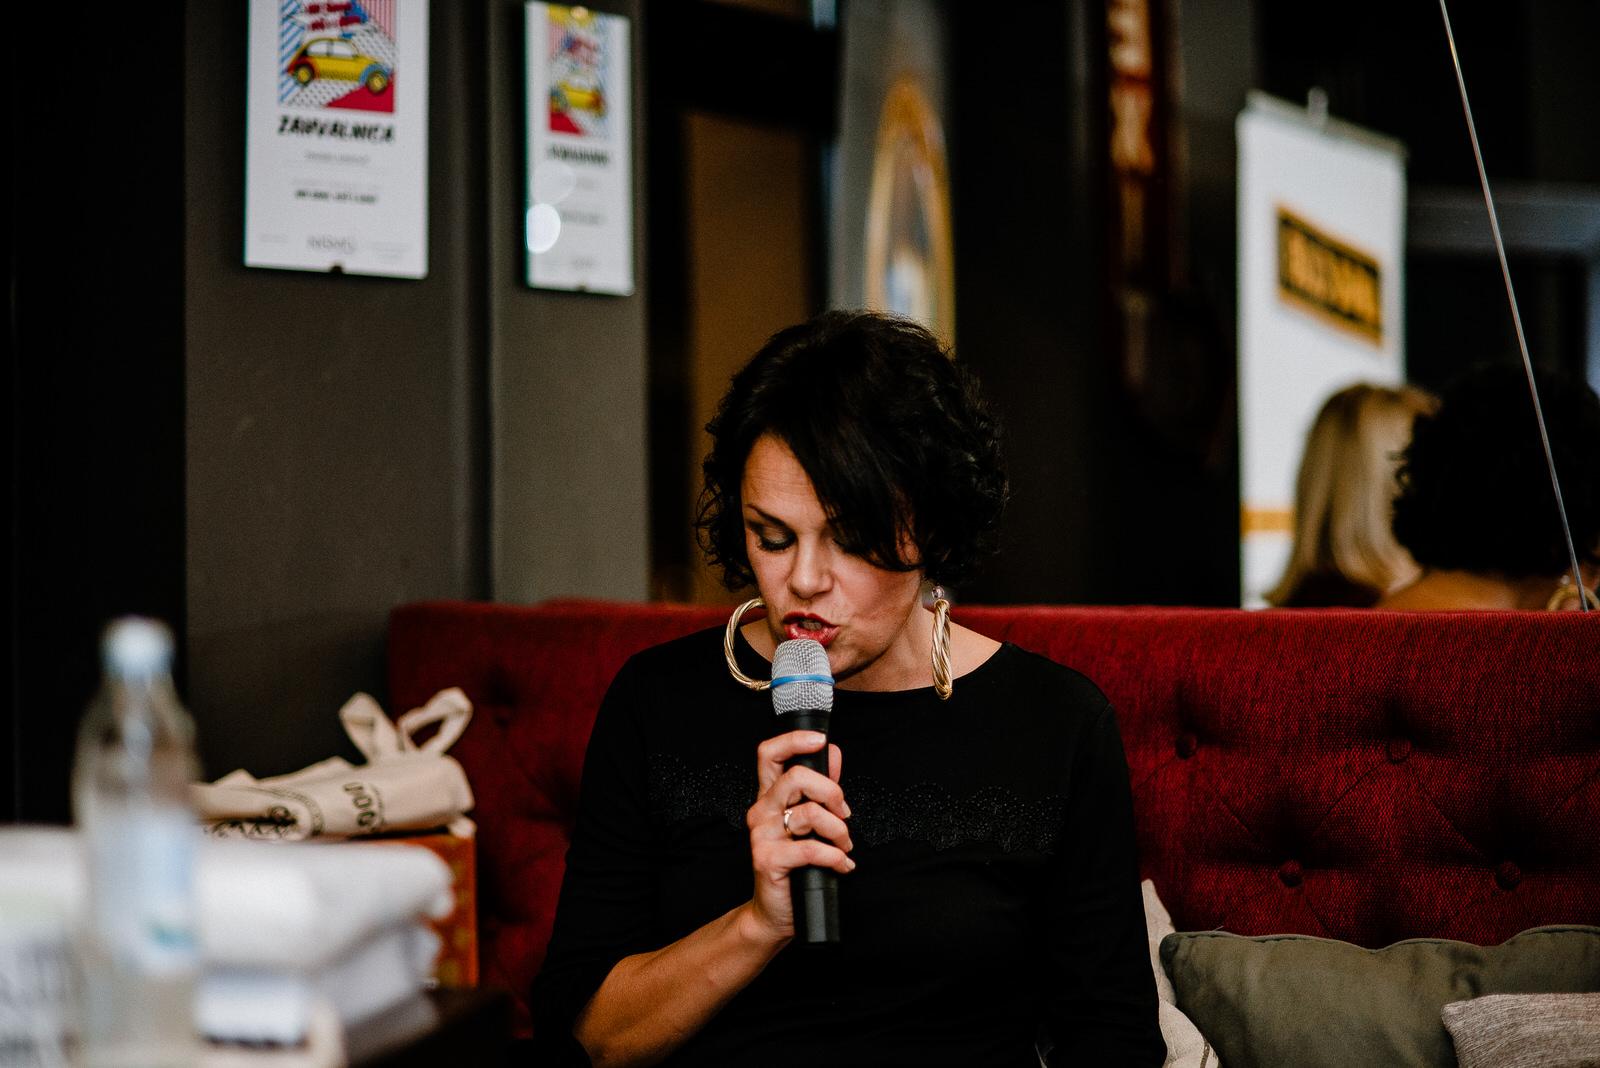 likaclub_otočac_book-caffe-paradisso_kenan-crnkić_2019-5